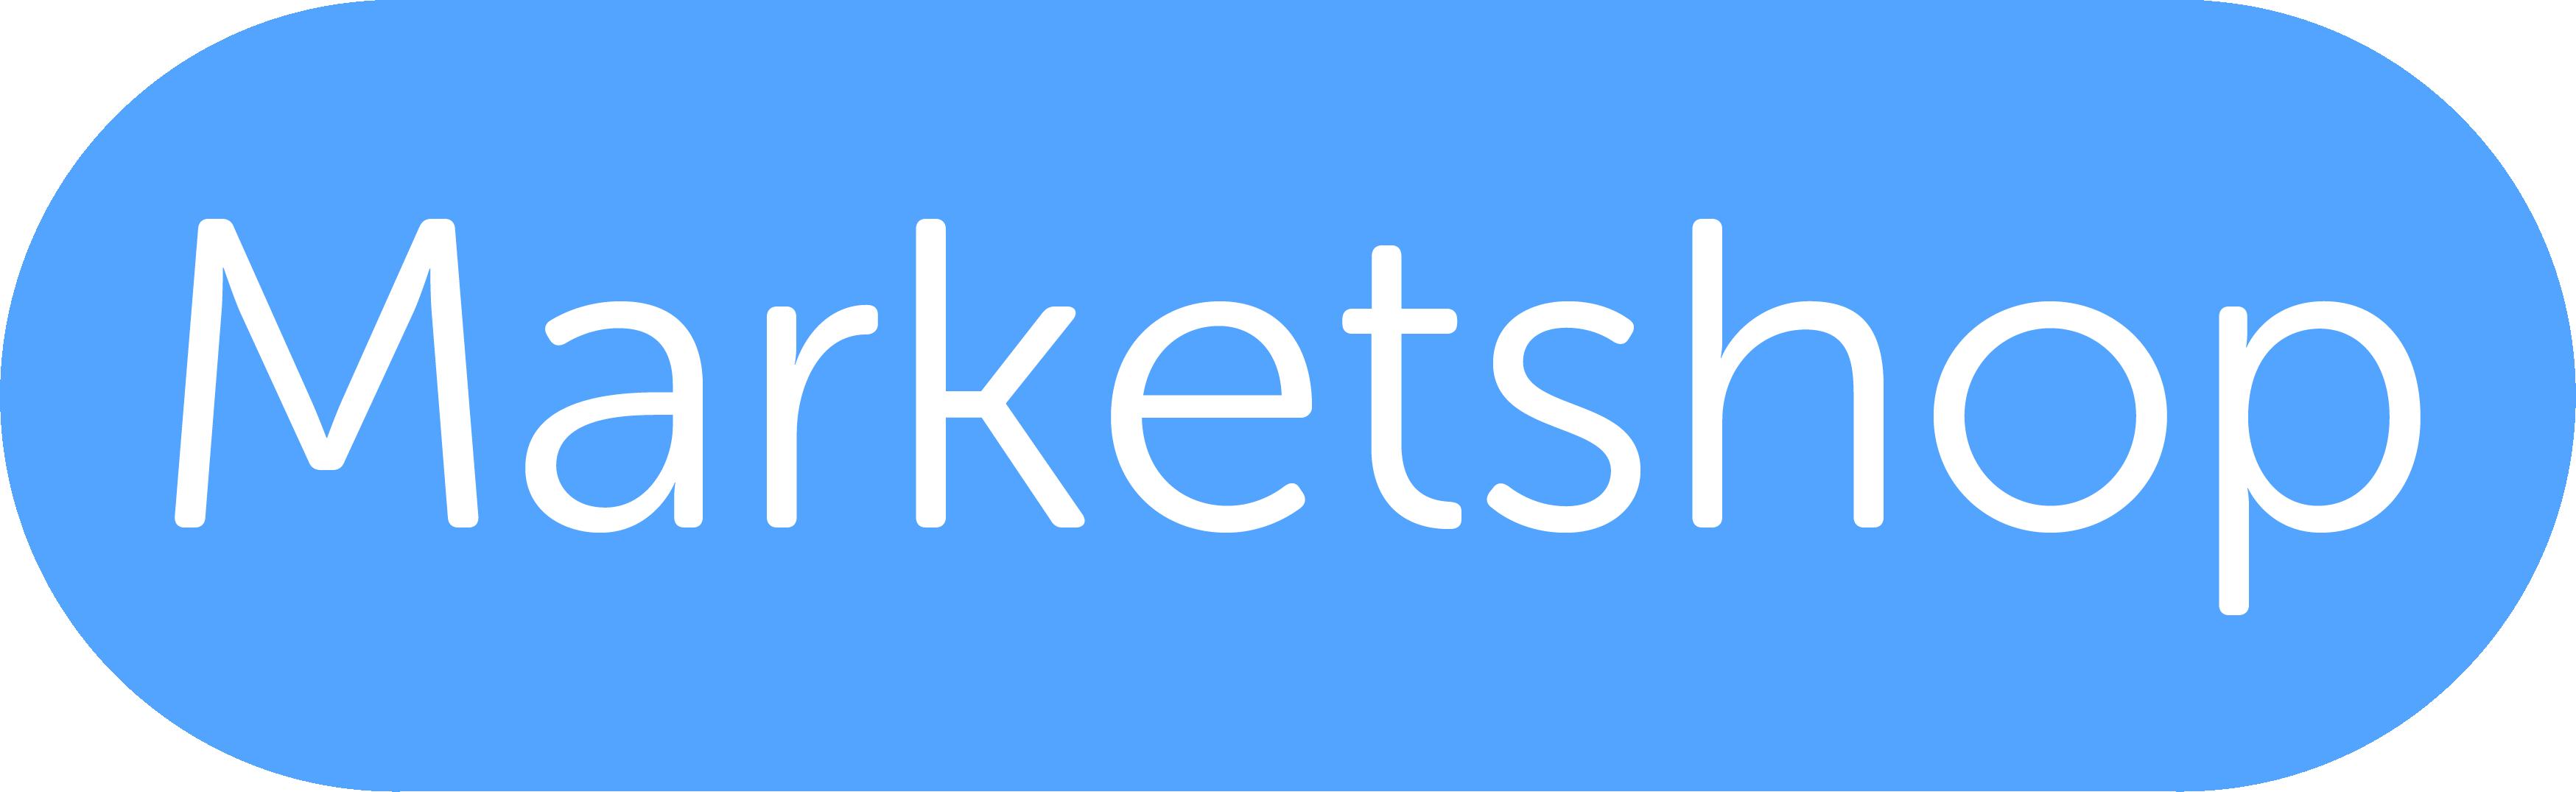 New Partnership with Marketshop